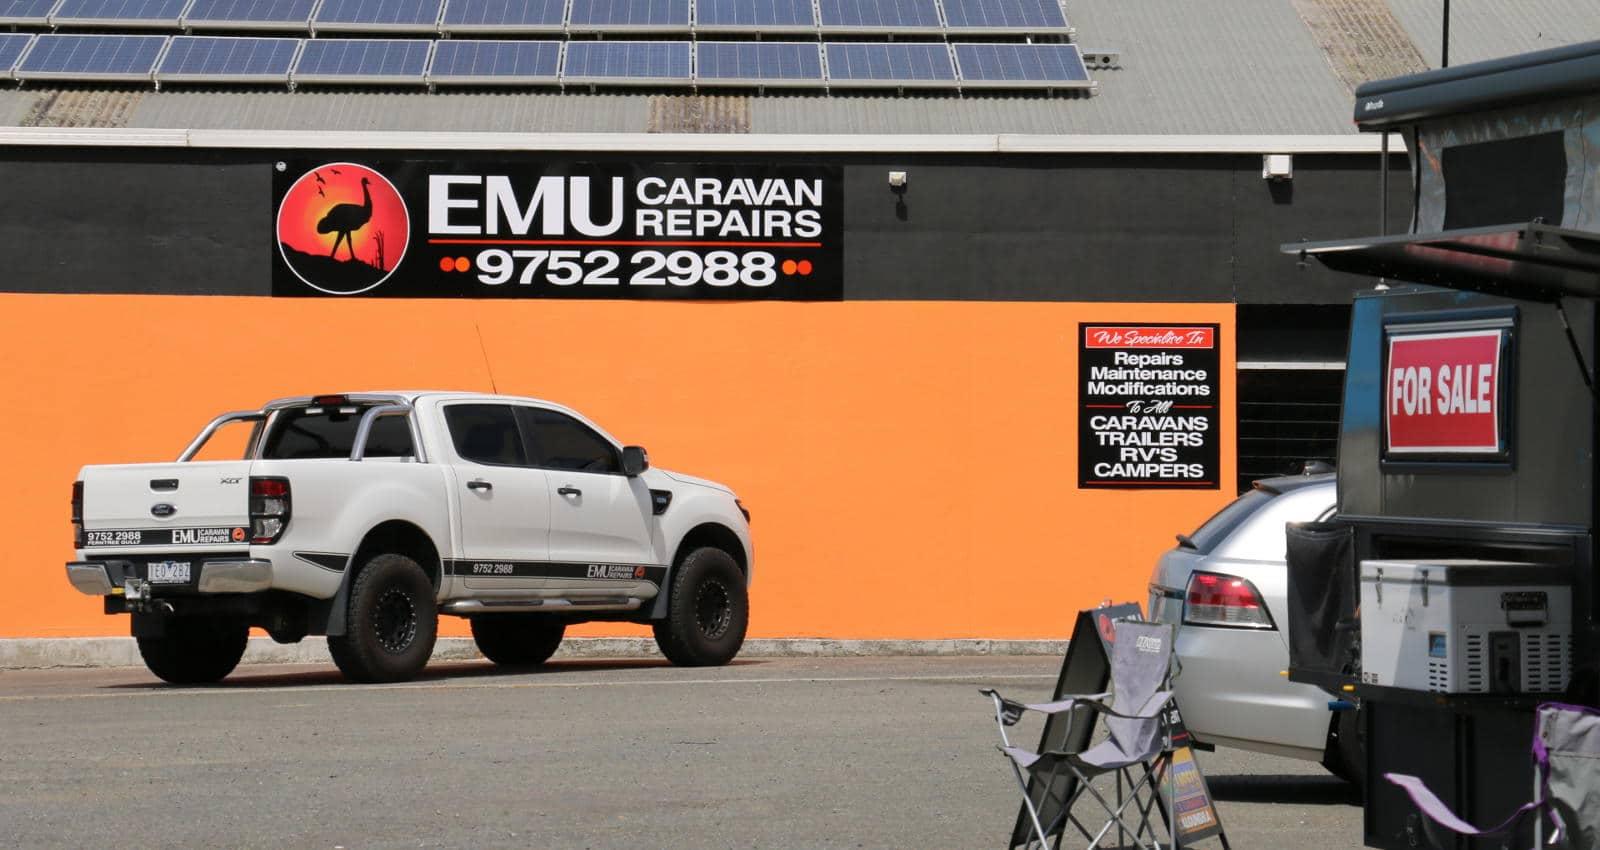 Outside Emu Caravan Repairs Melbourne-1600X850